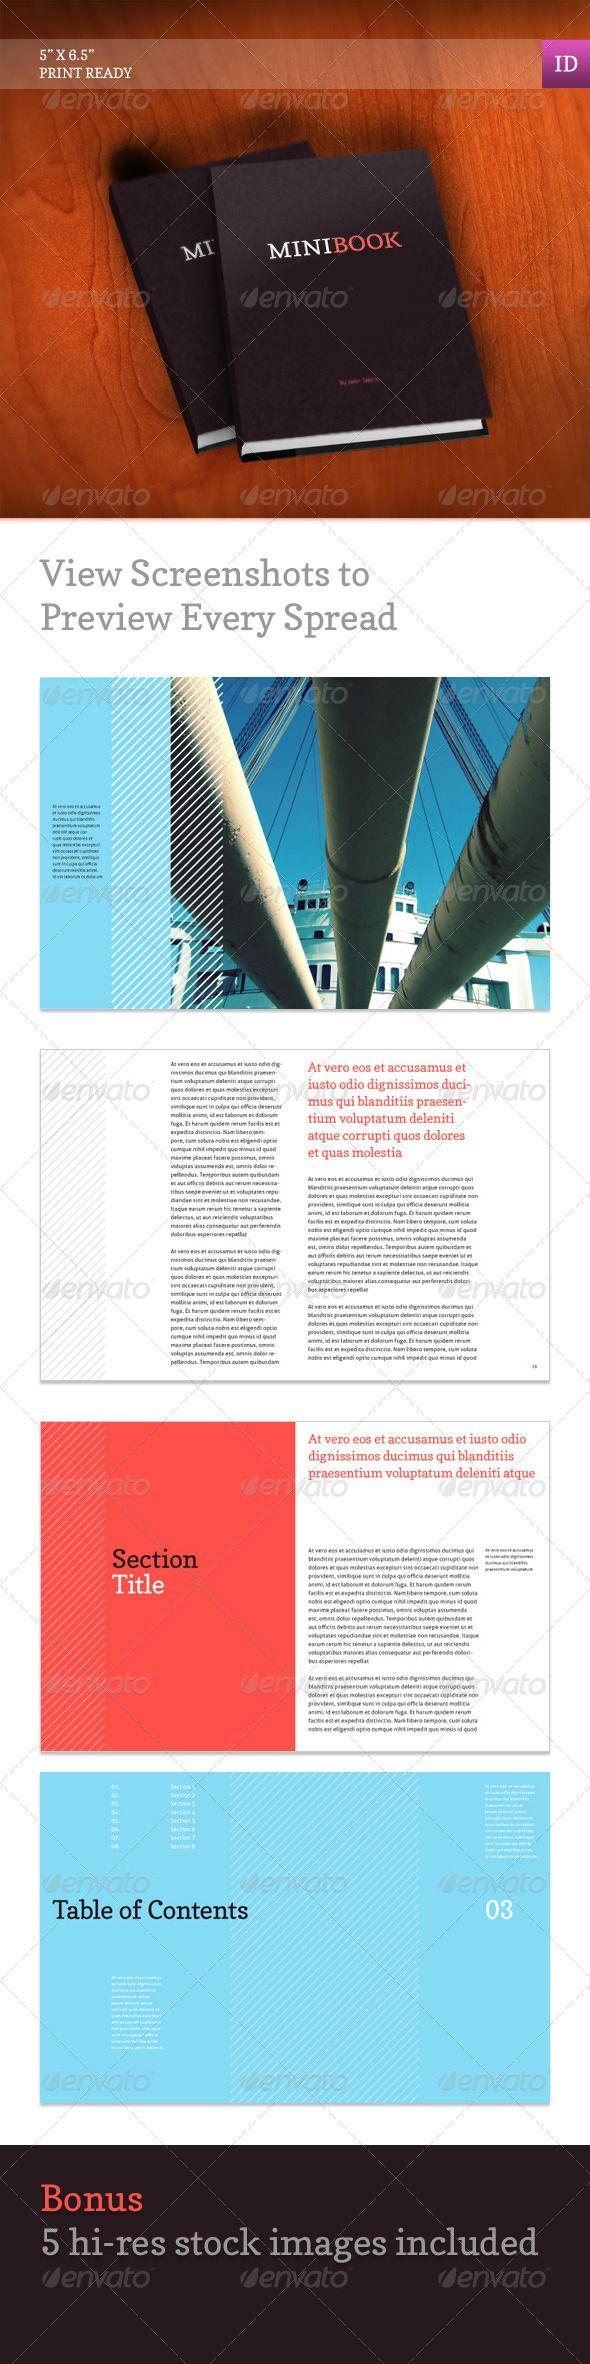 7 best InDesign Tesis images on Pinterest | Print templates, Adobe ...